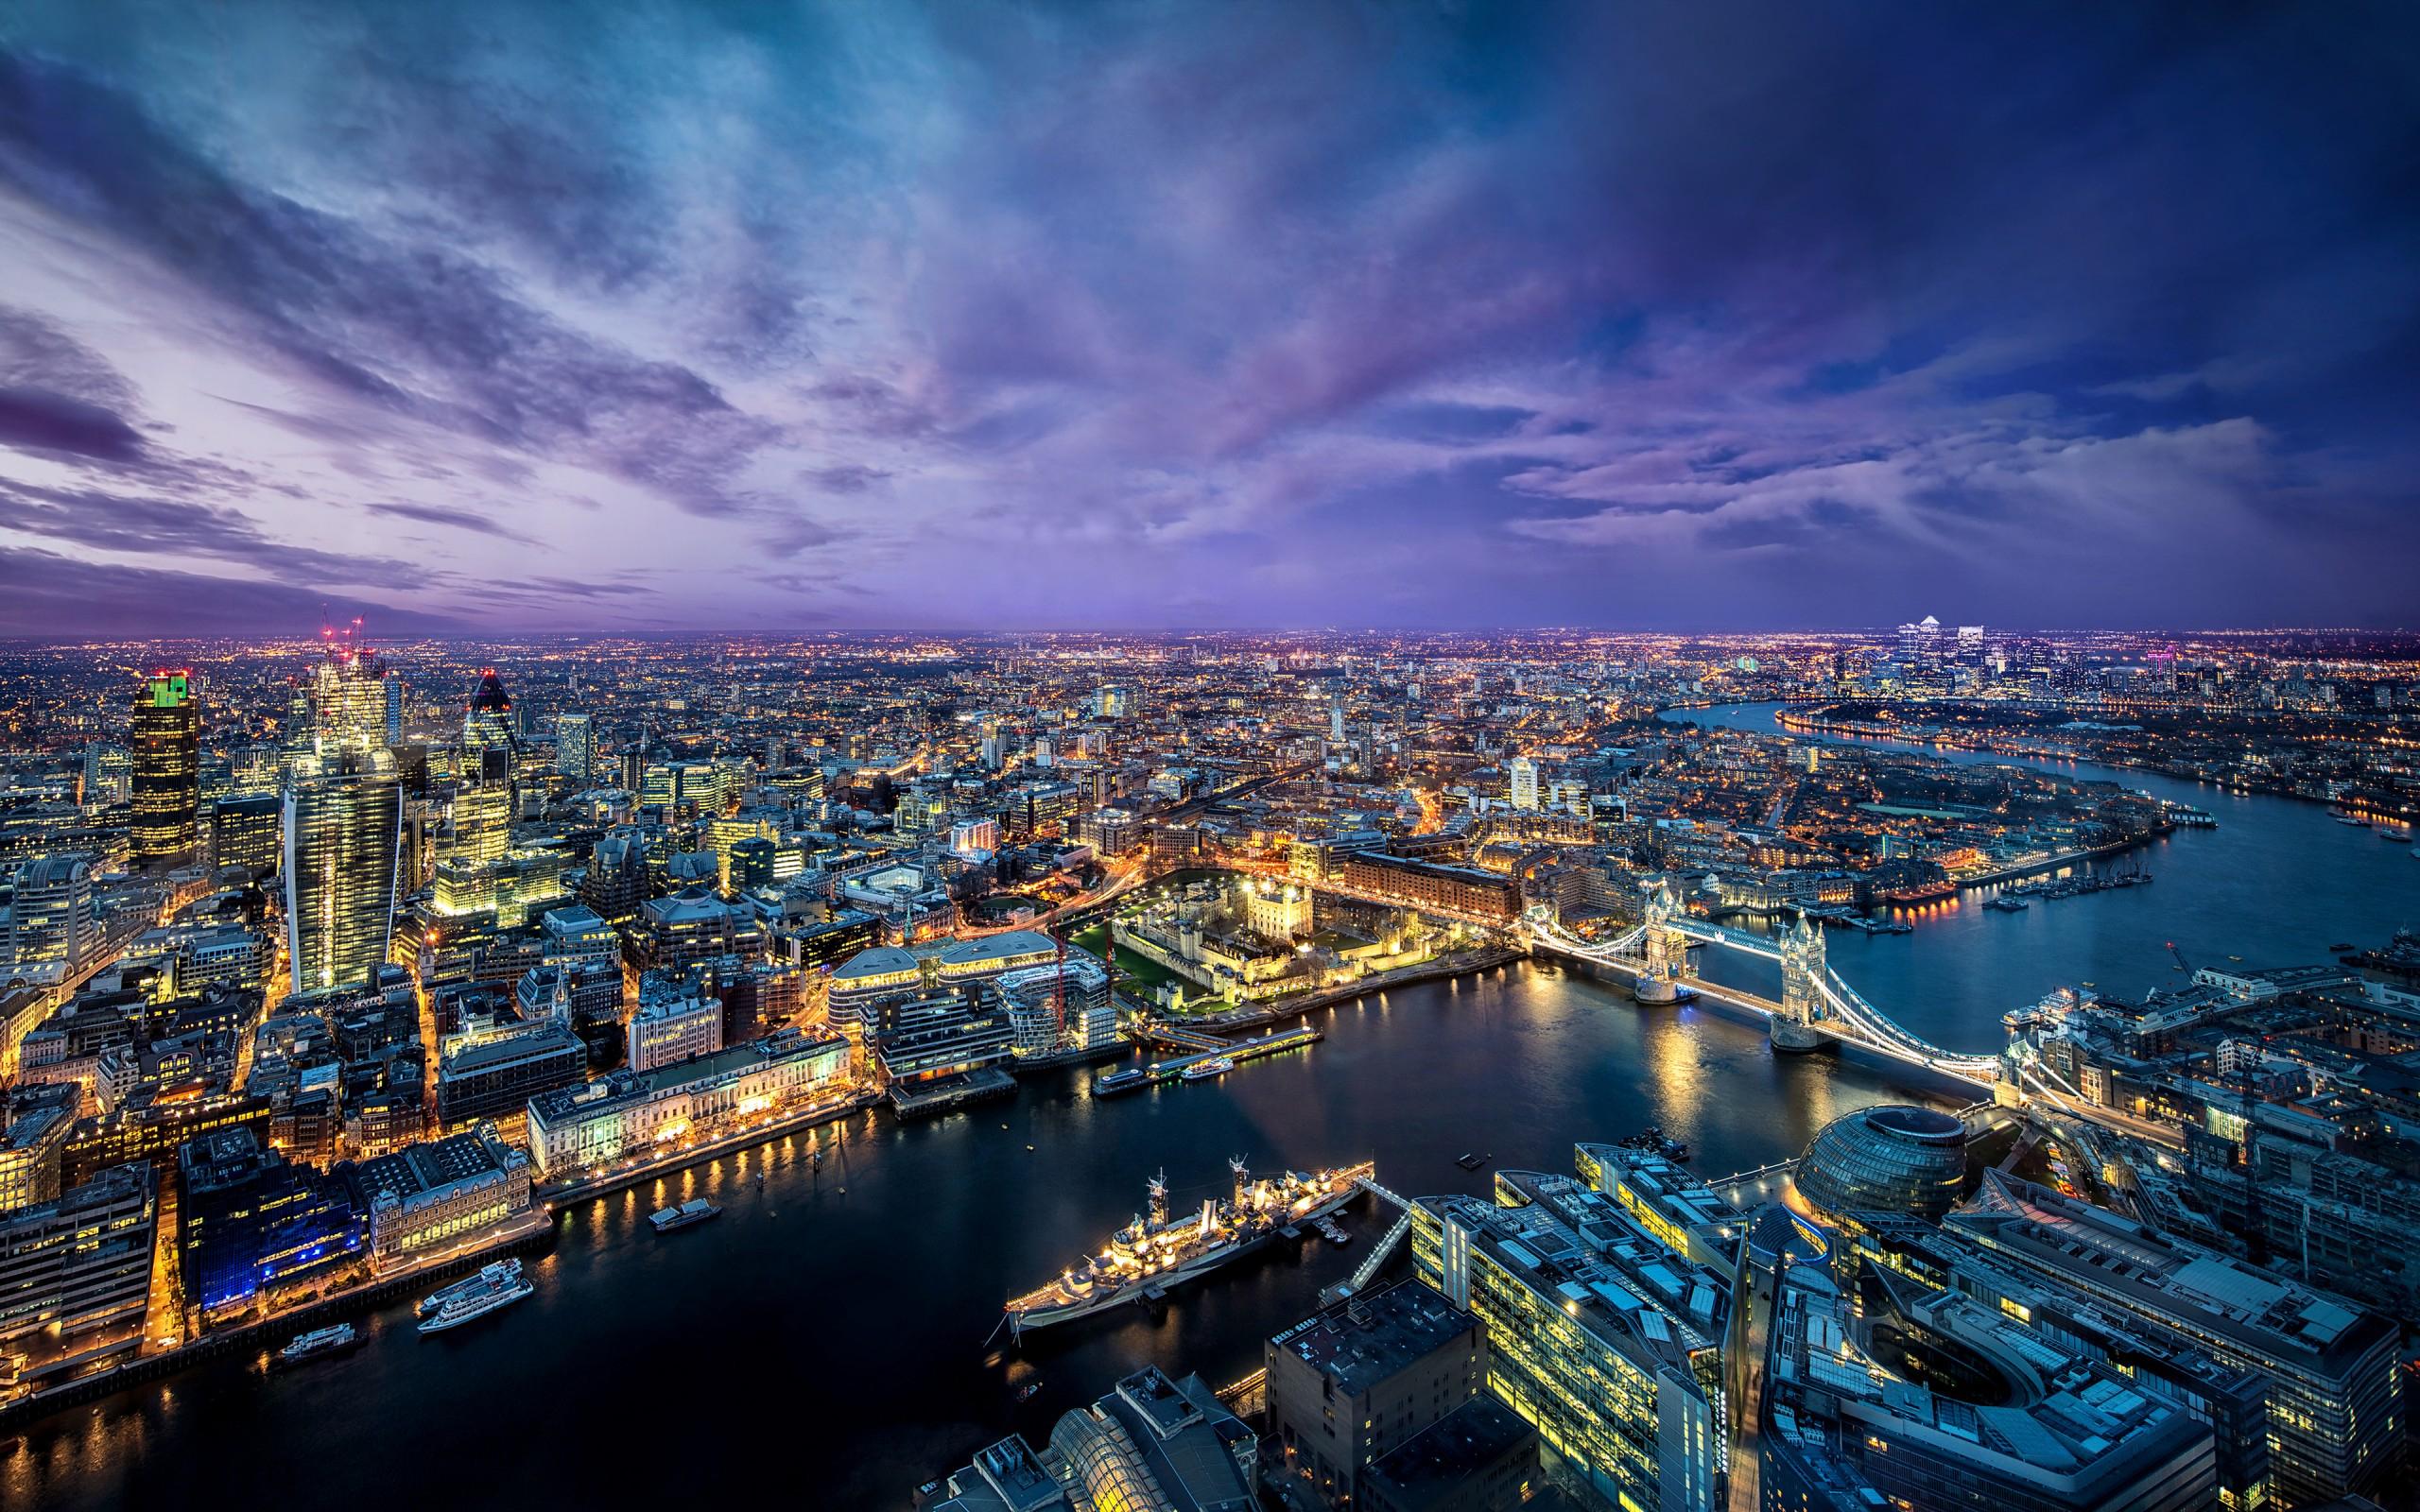 Night London 2560 x 1600 Locality Photography MIRIADNACOM 2560x1600